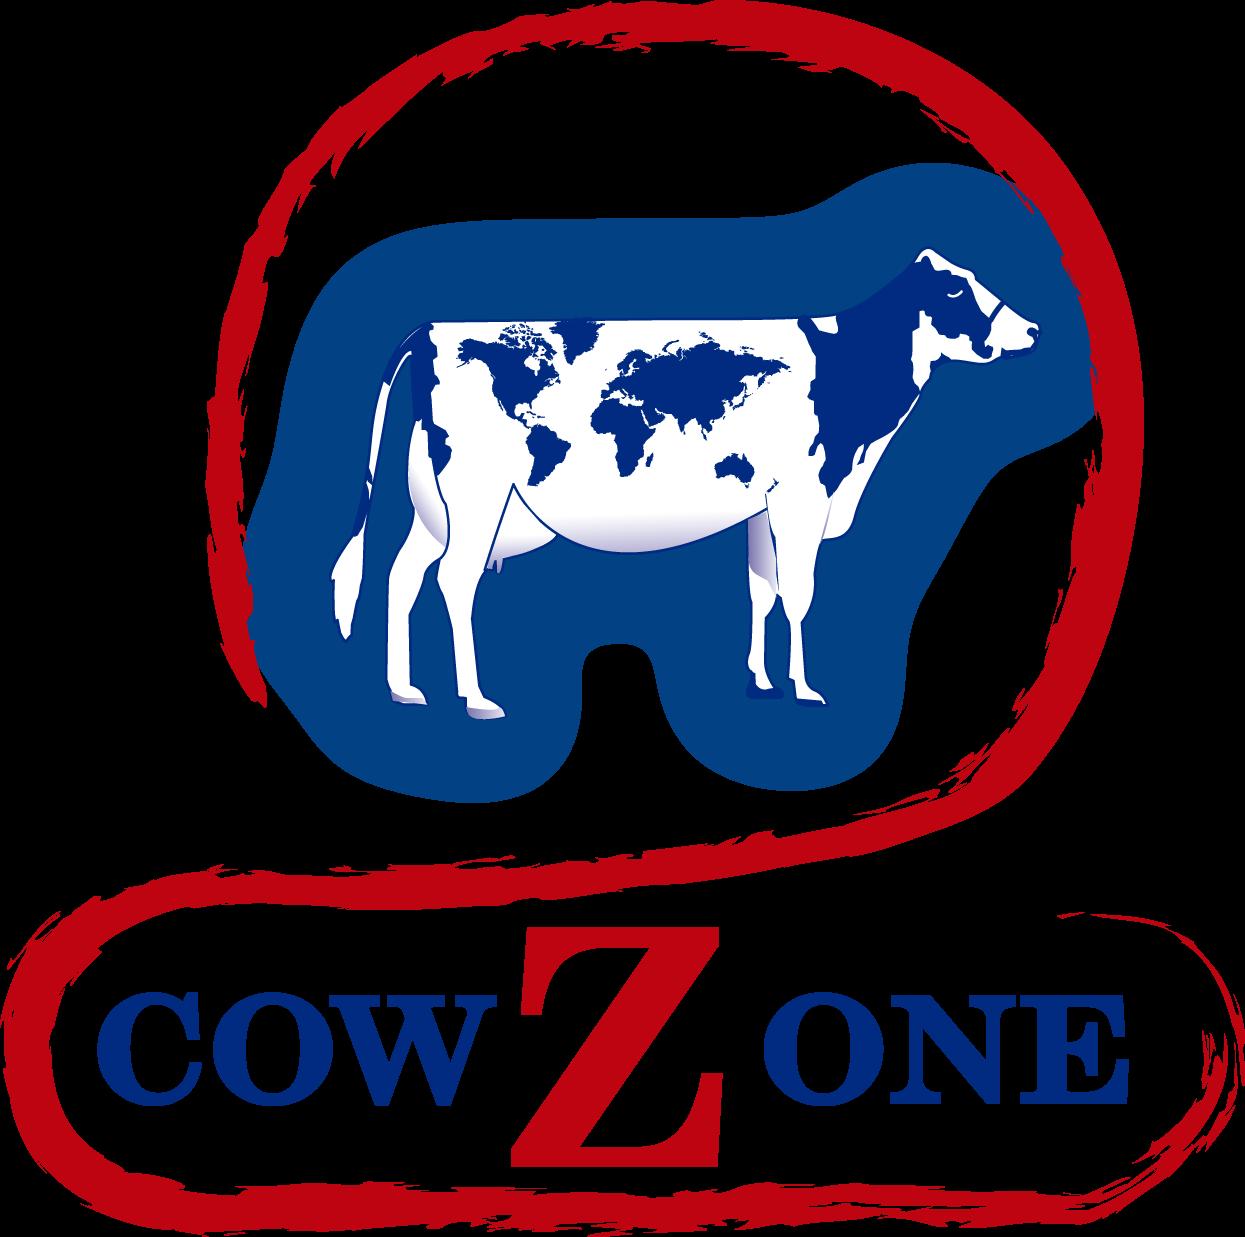 Cowzone